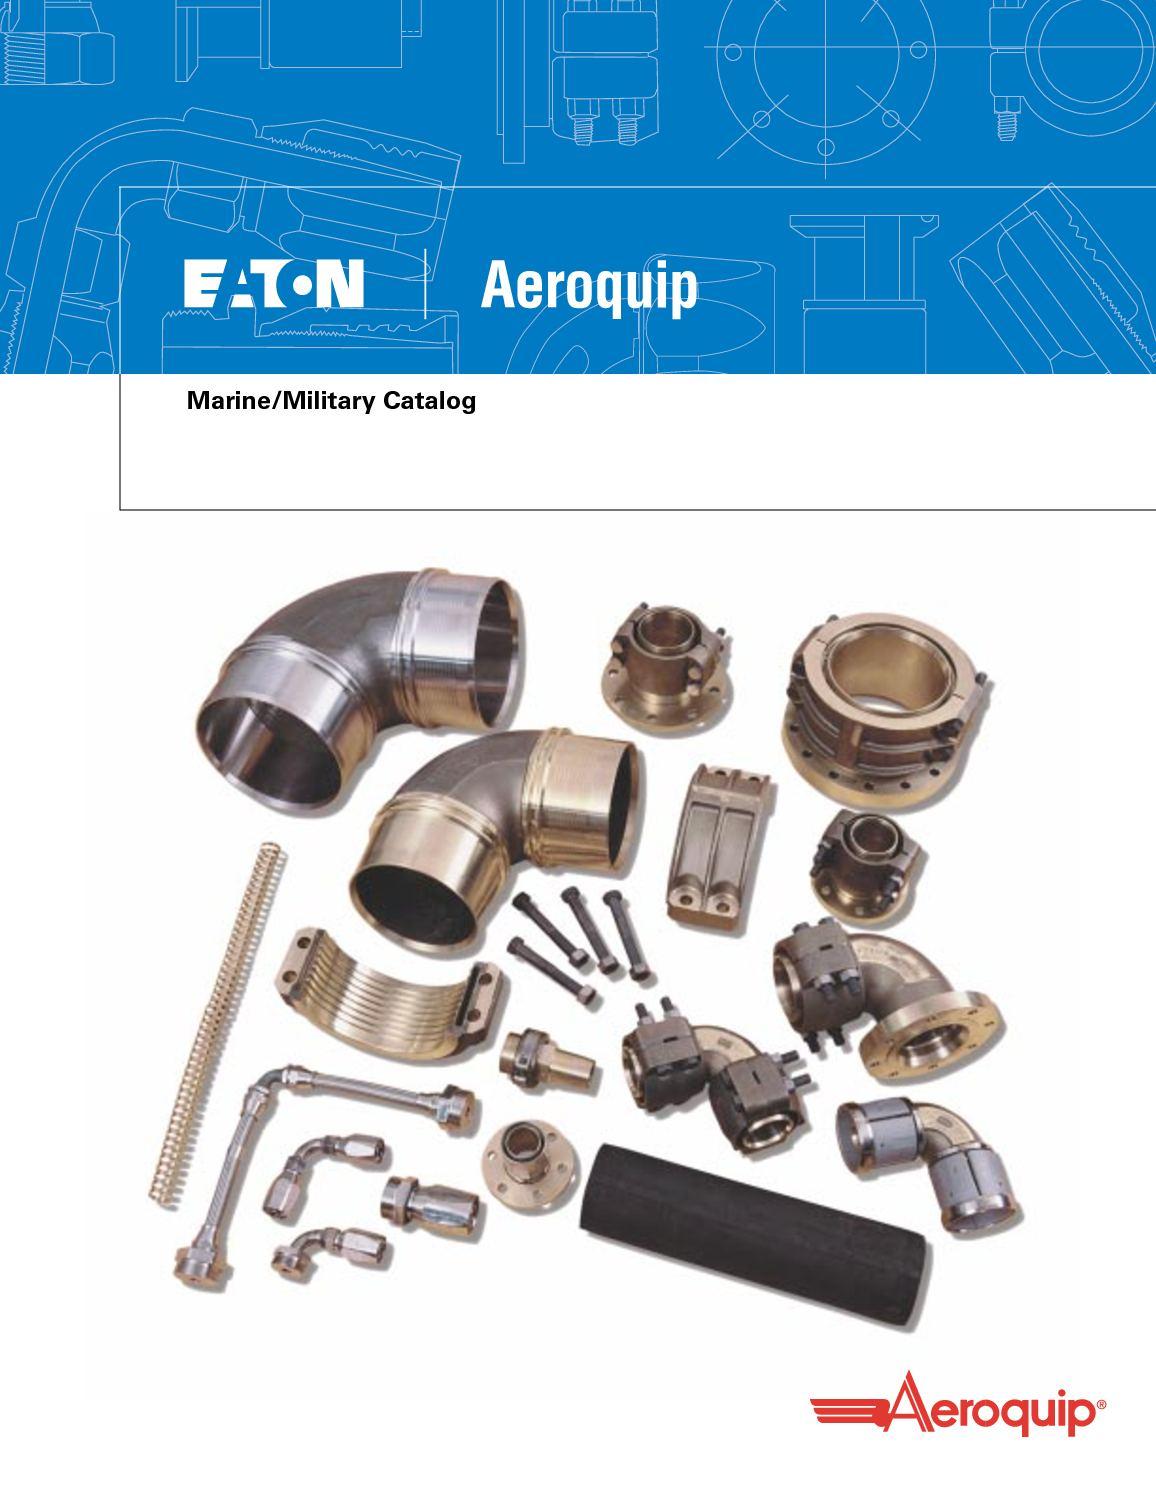 4412-8-8S Hydraulic Hose Fitting Eaton Aeroquip